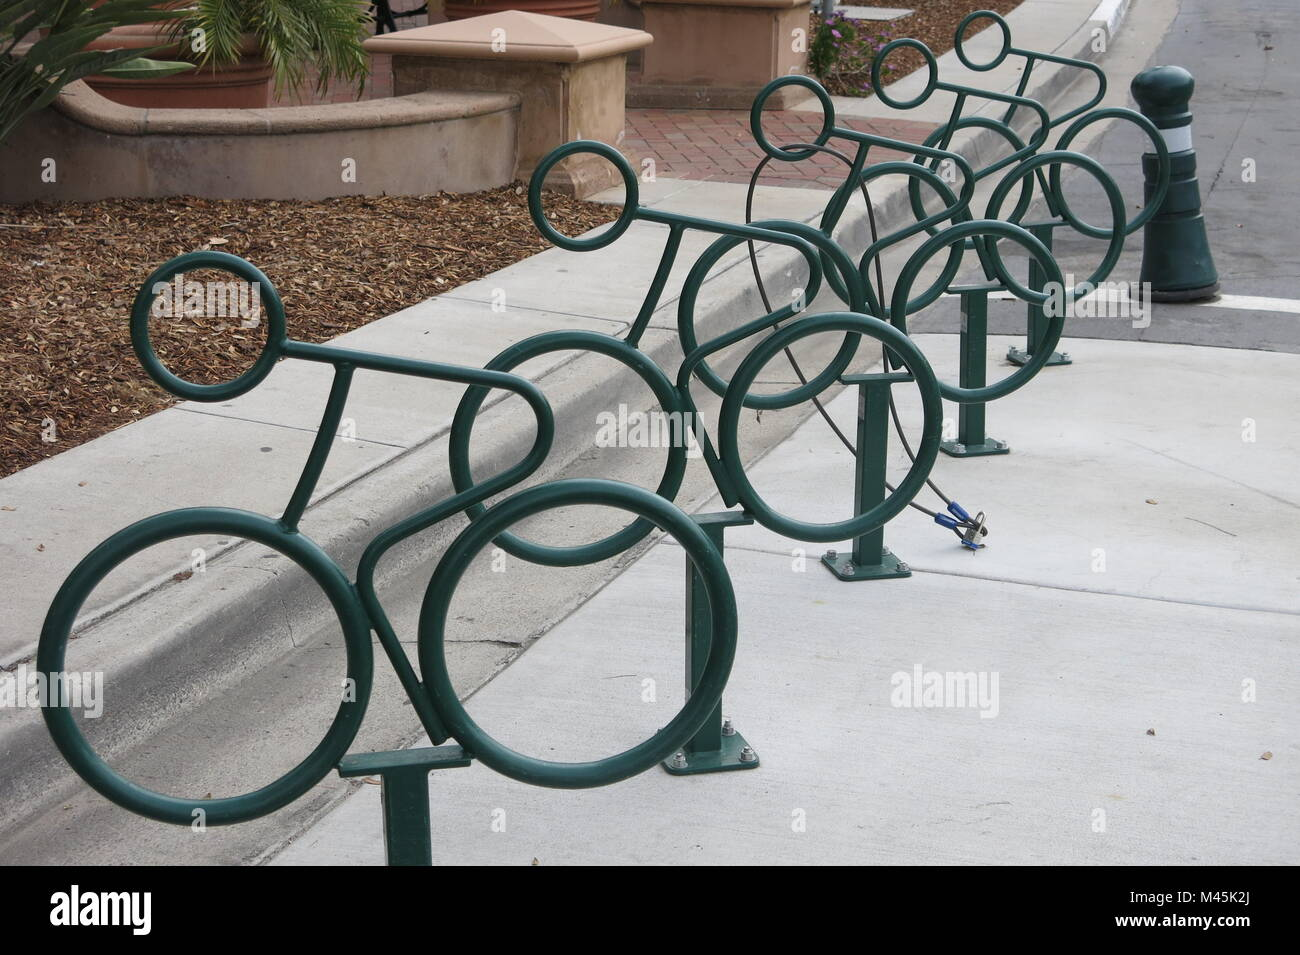 Cycle racks add to the street furniture on Coronado Island, San Diego - Stock Image